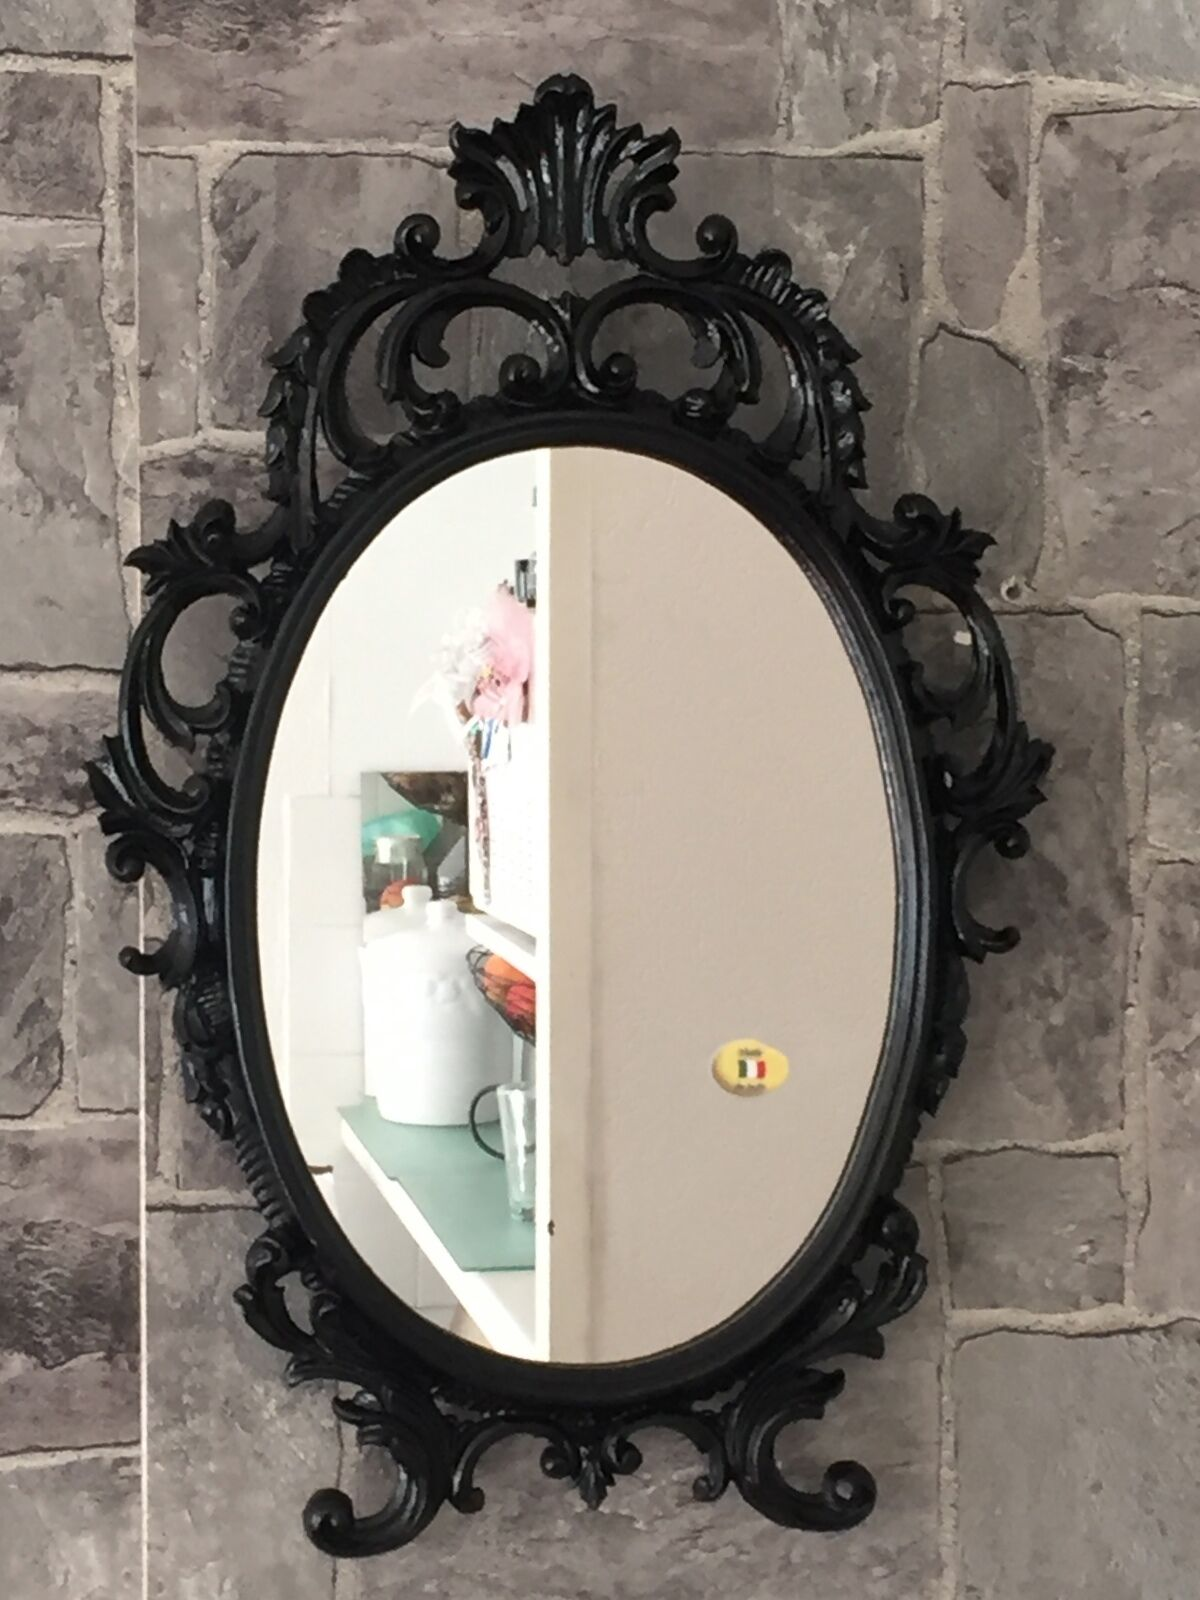 Wandspiegel oval barock gold silber schwarz wei 43x28cm spiegel antik shabby kaufen bei - Spiegel oval silber ...